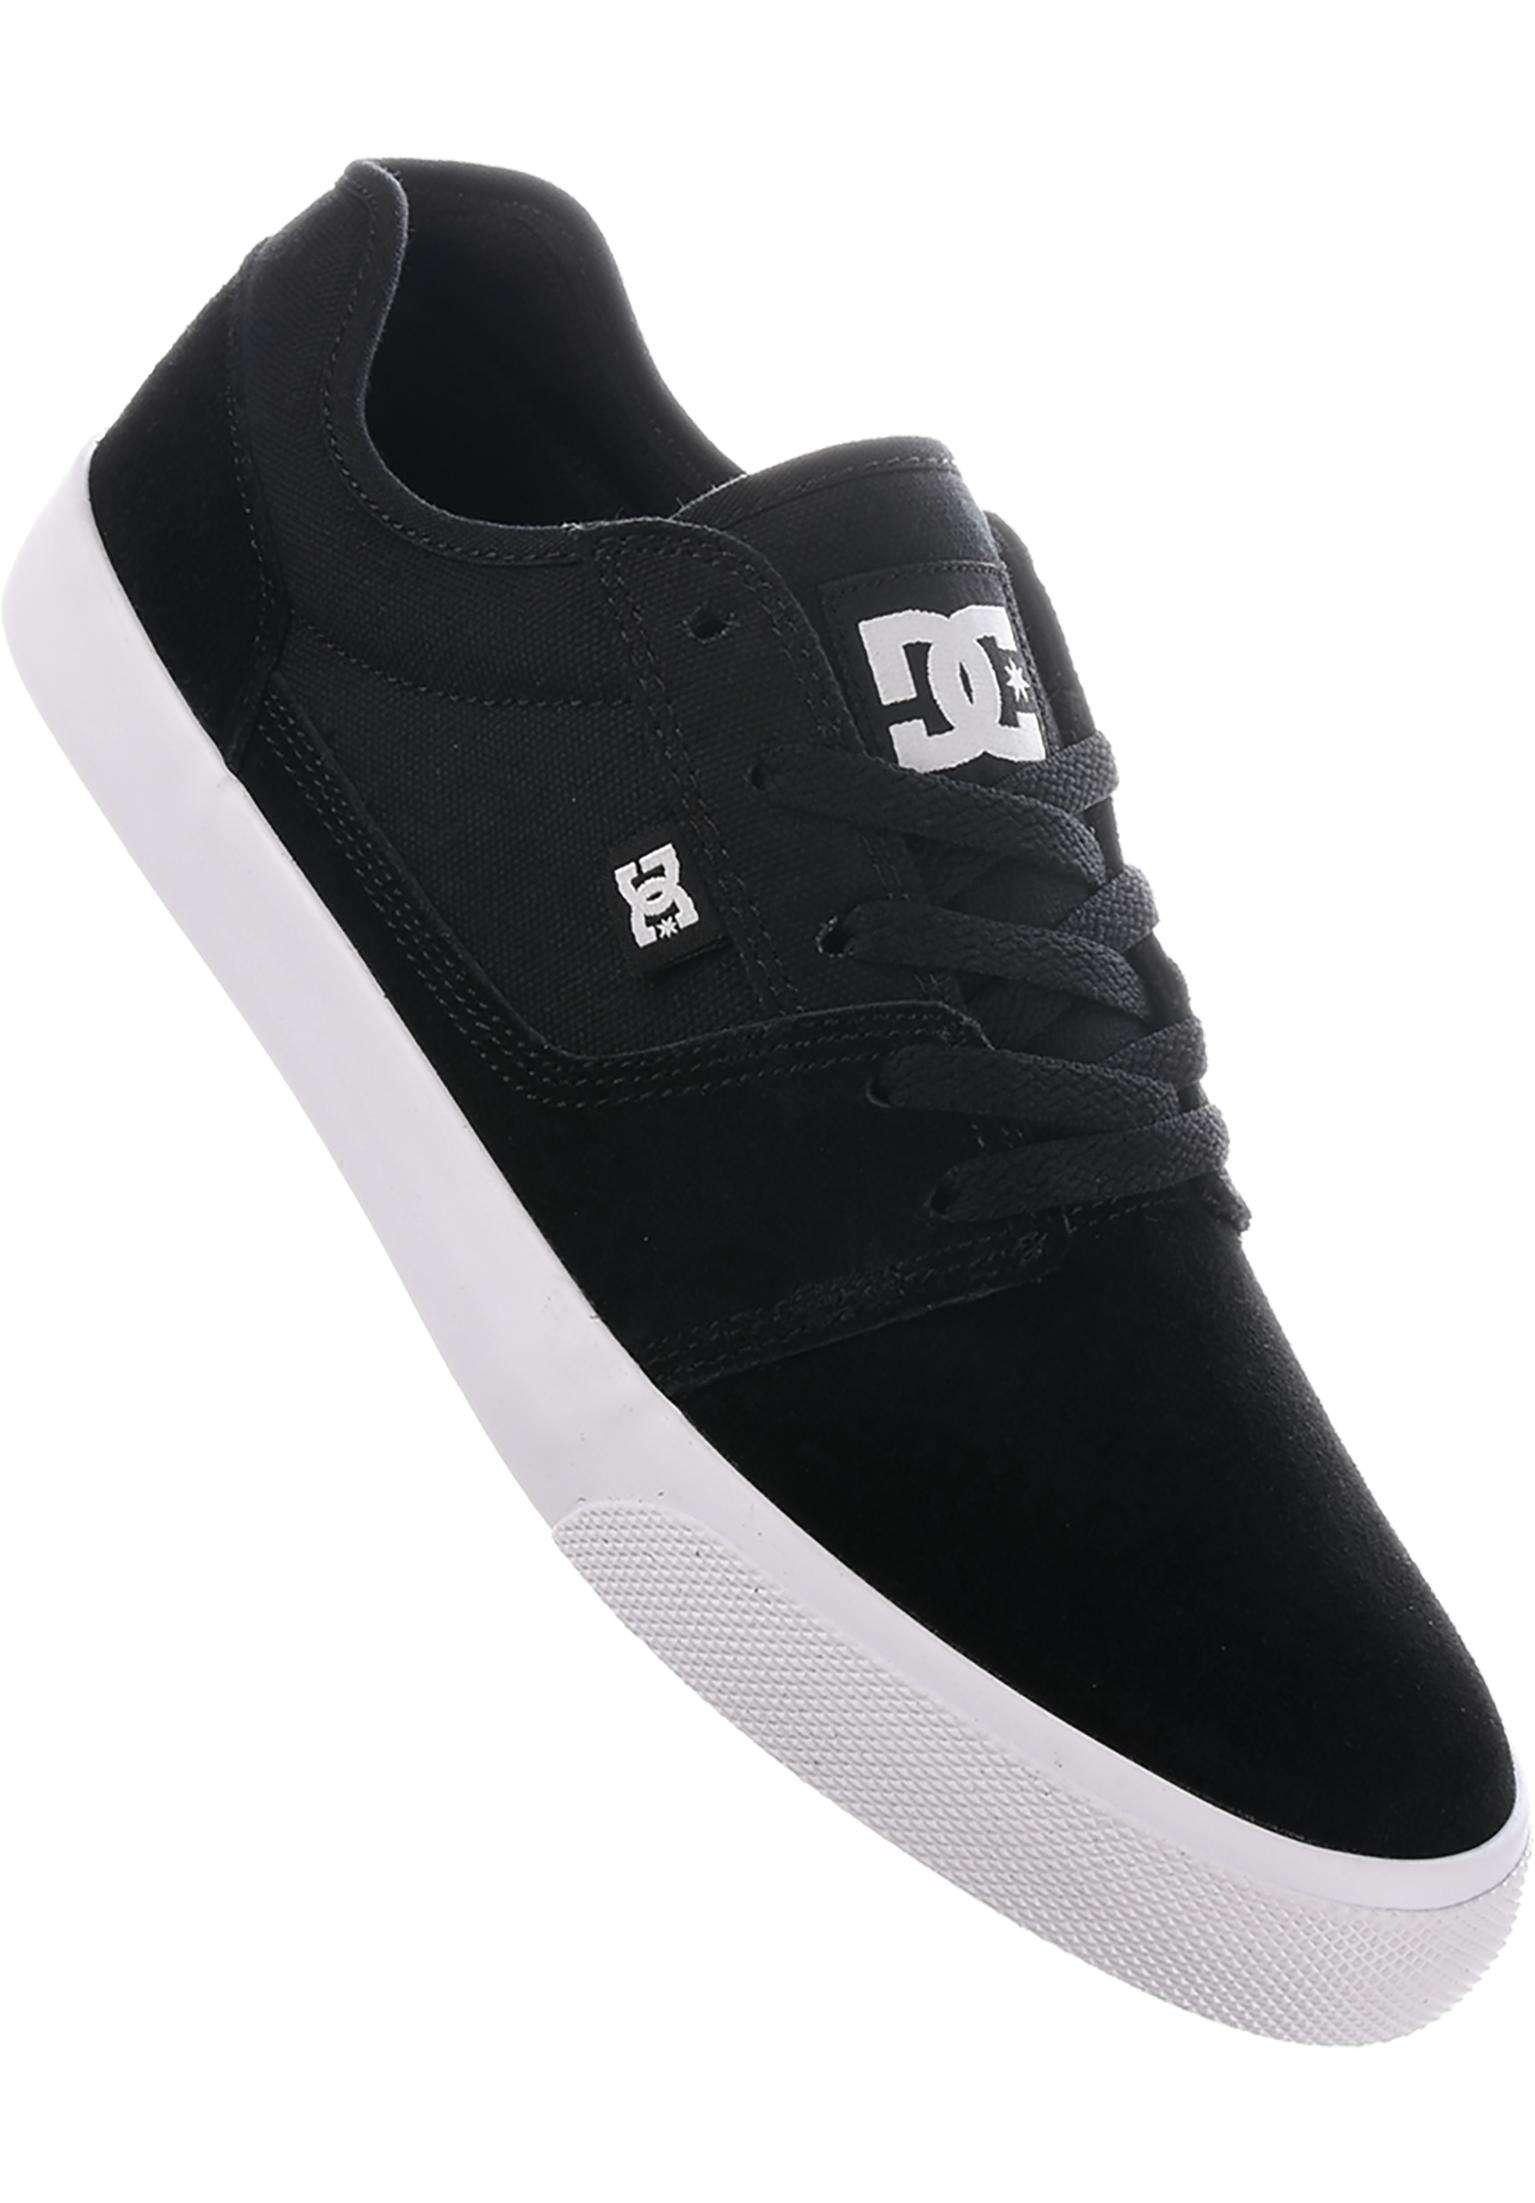 7b28285be11d Tonik DC Shoes Alle Schuhe in black-white für Herren | Titus